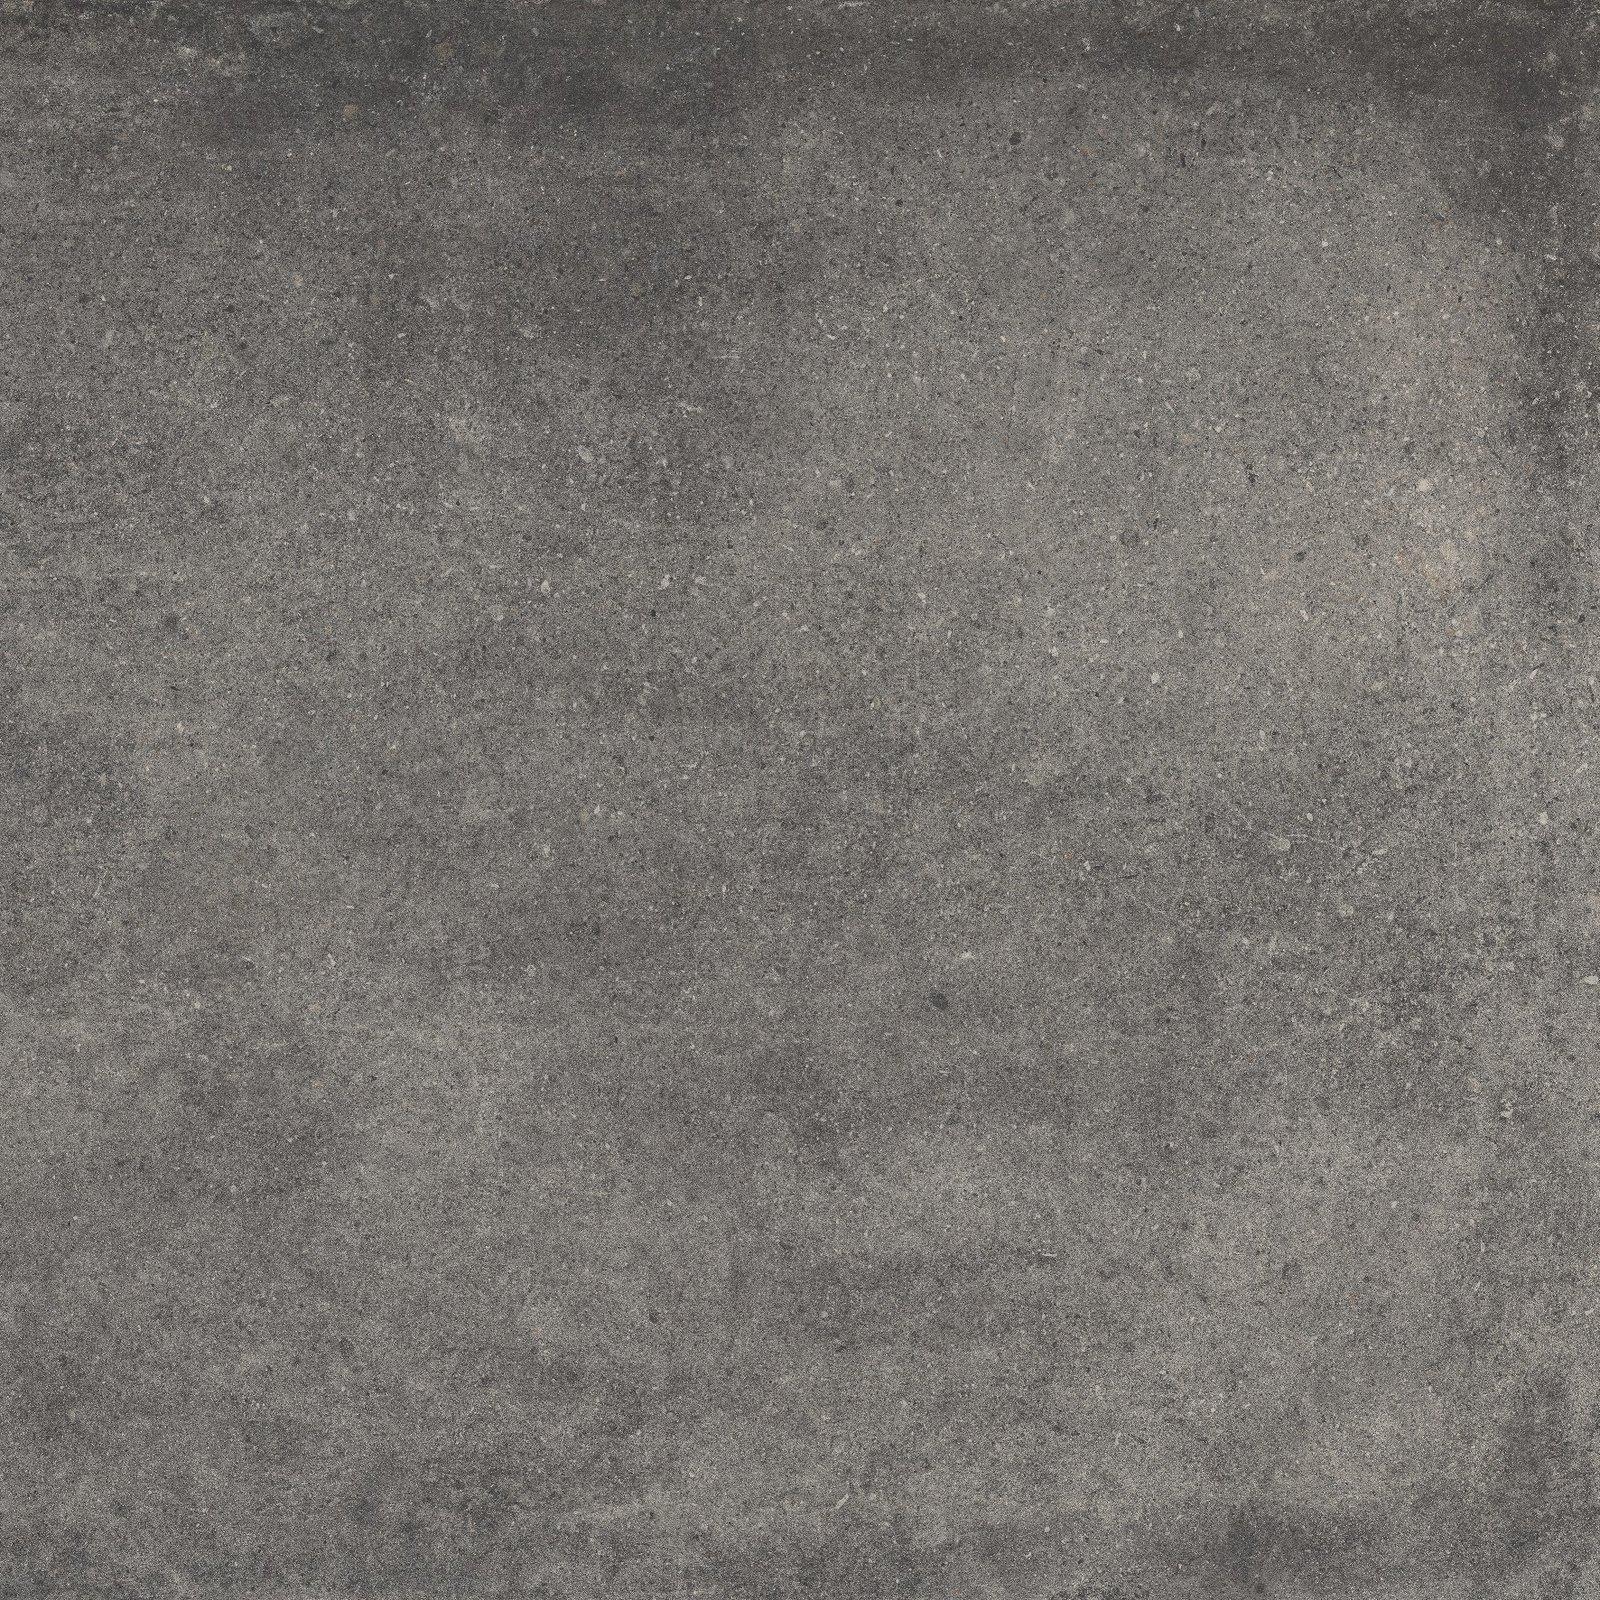 Плитка BLACK (X60RM9R) изображение 4